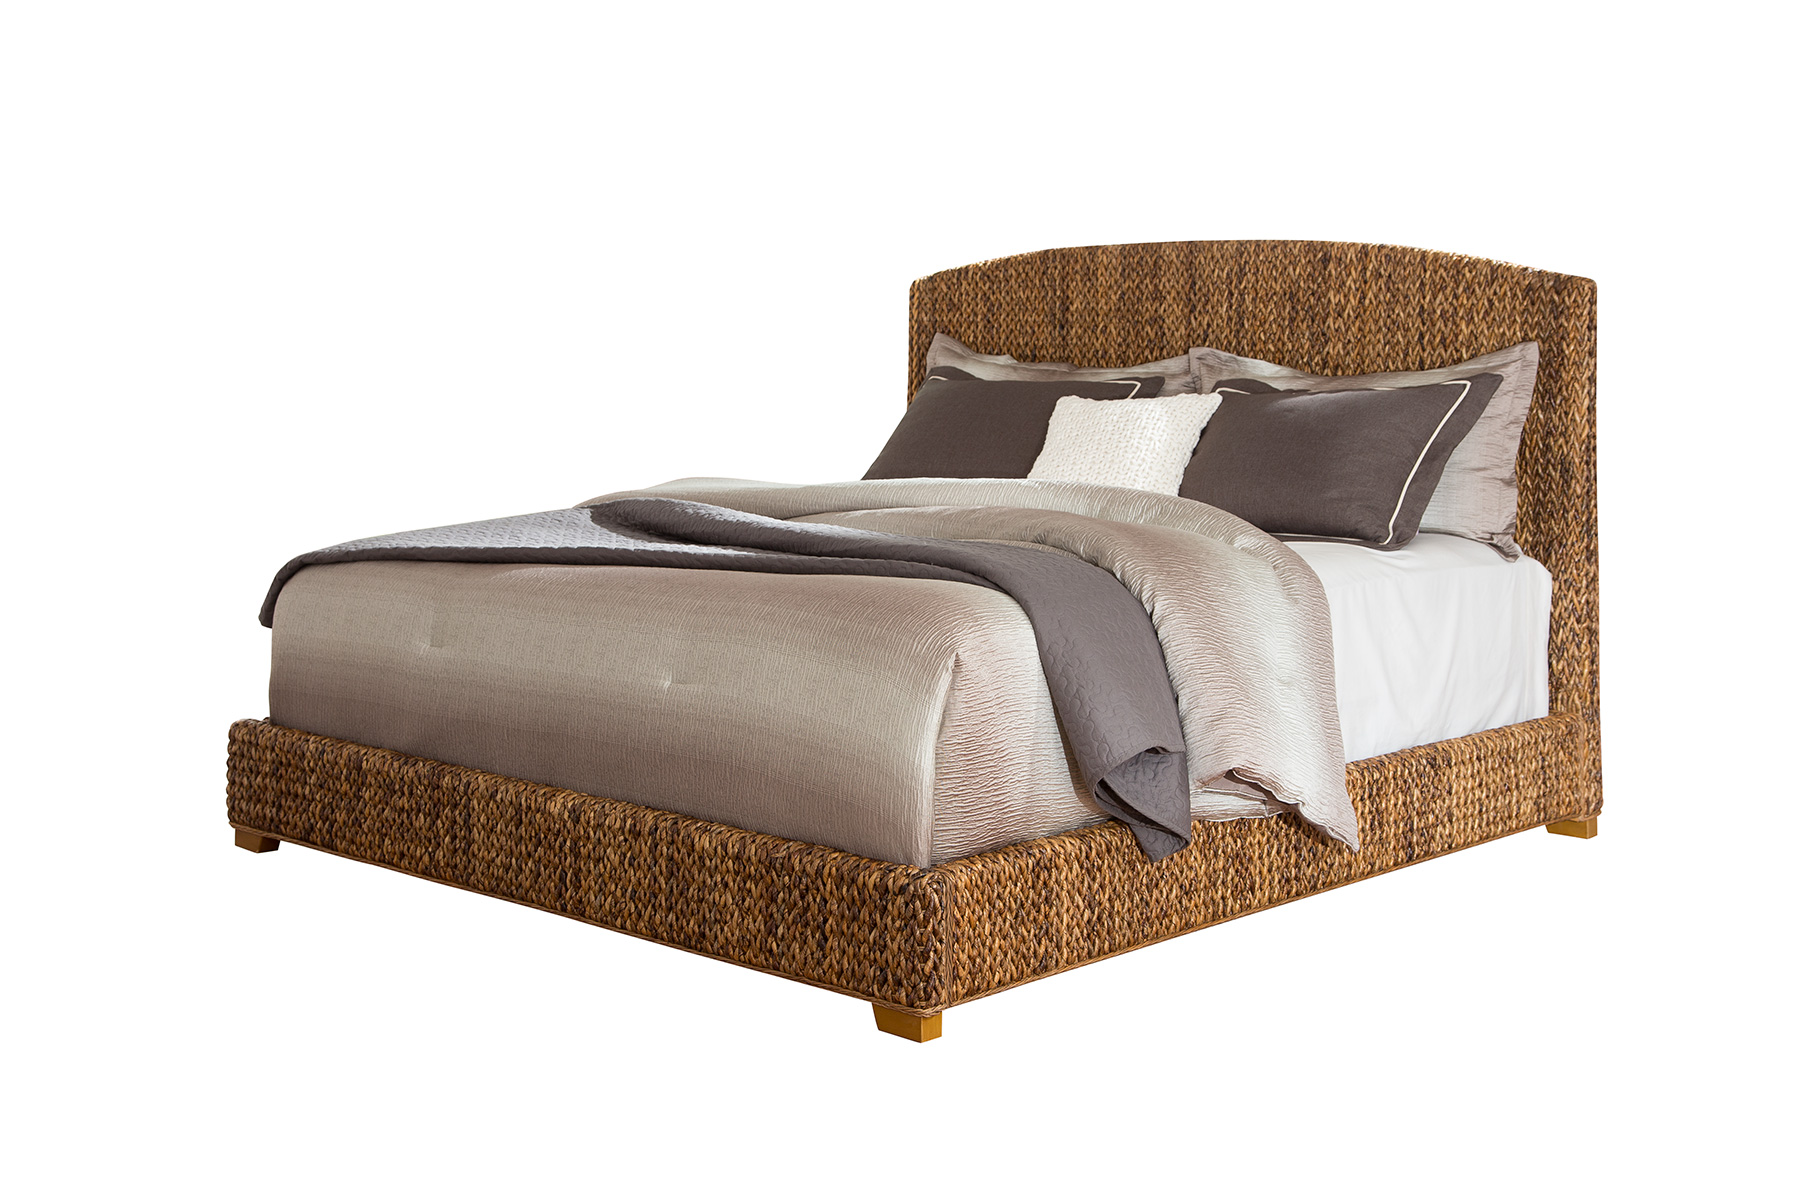 Laughton King Bed